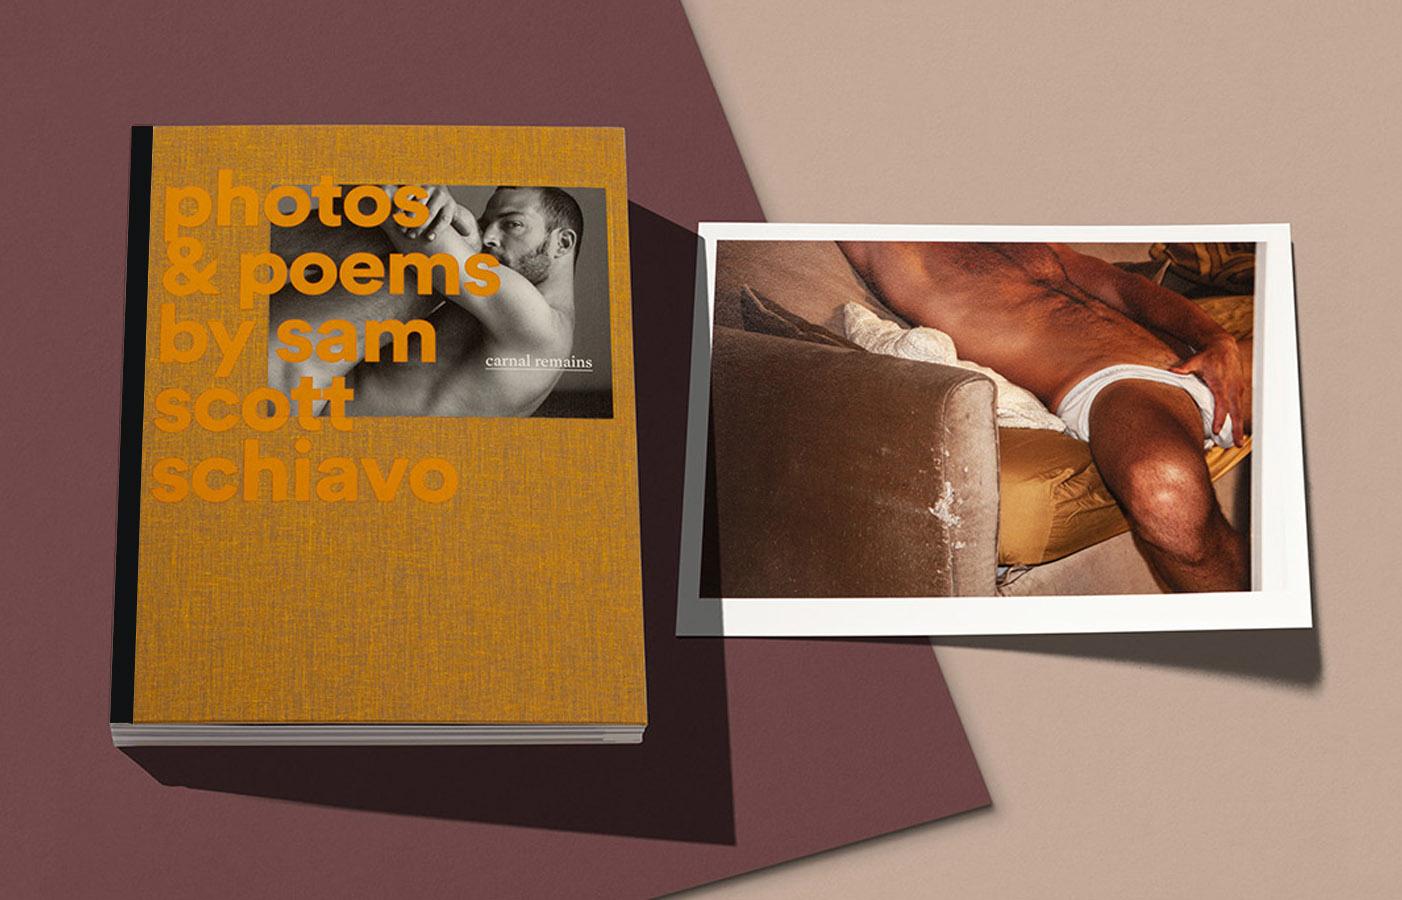 CR_Books_SamScottSchiavo_Print_02_schwarz.jpg